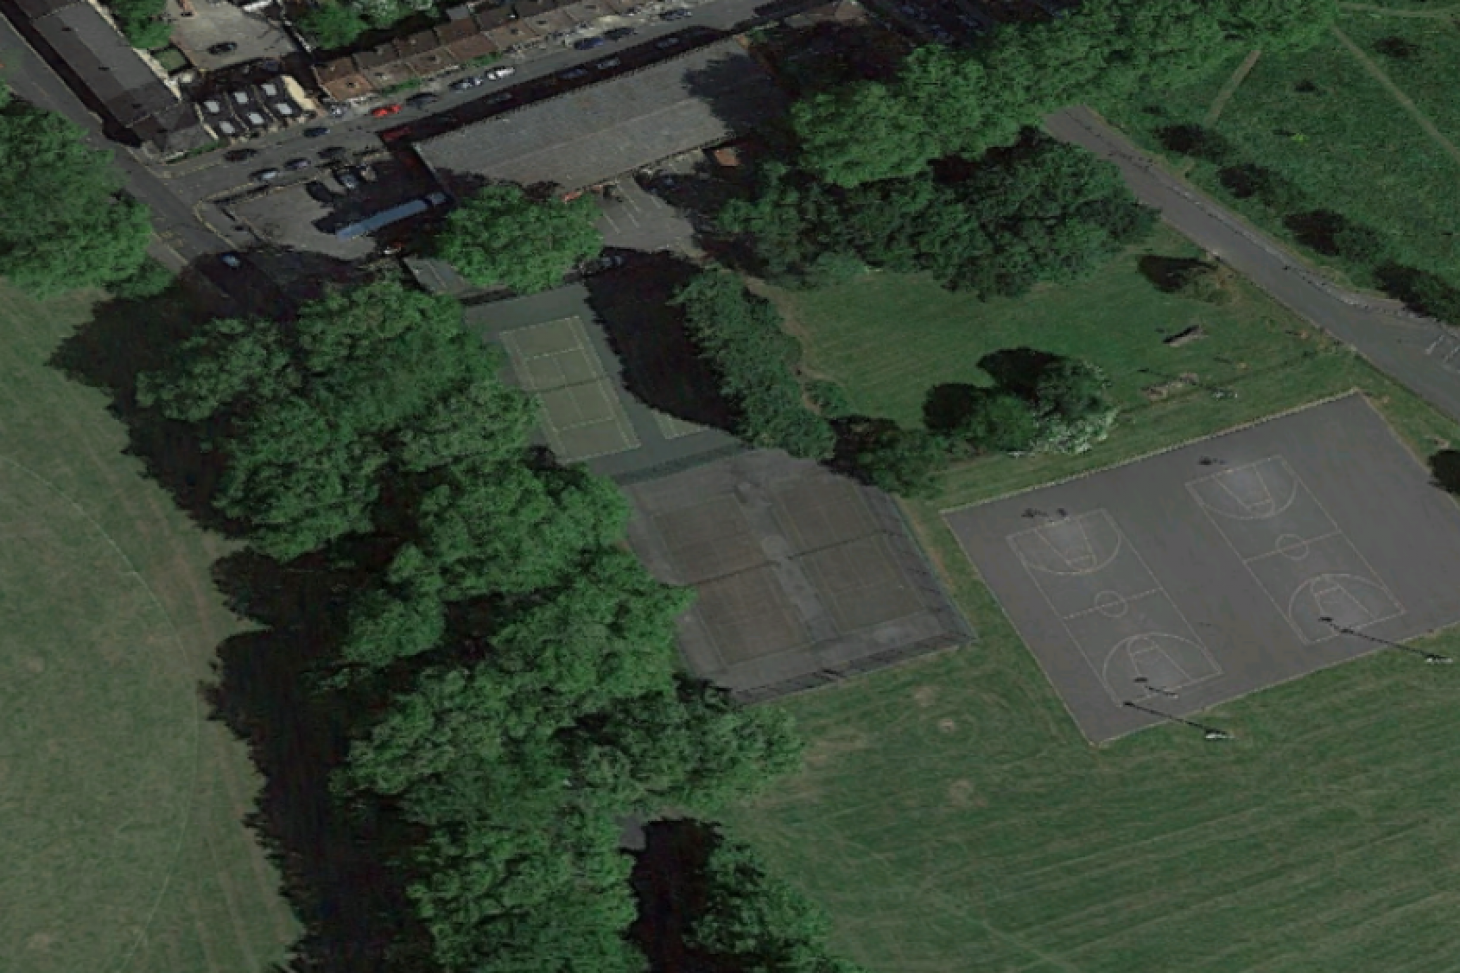 Millfields Park Outdoor | Hard (macadam) tennis court